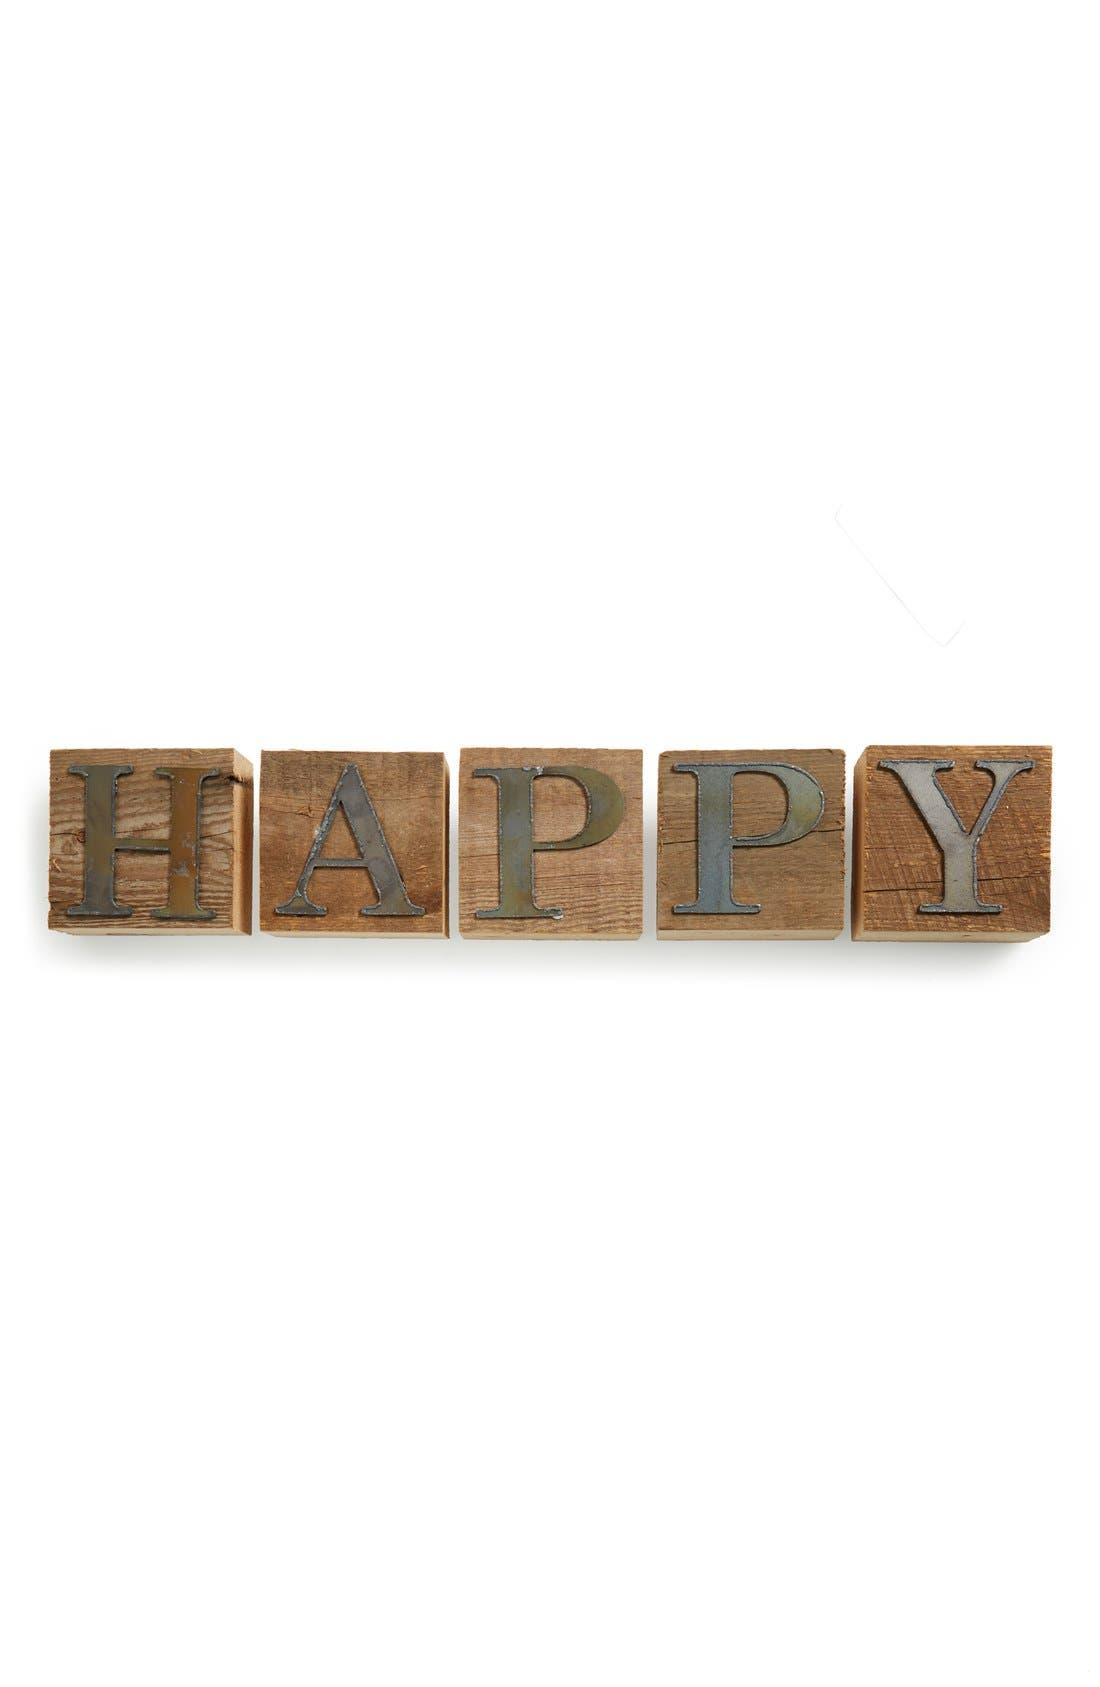 Alternate Image 1 Selected - Second Nature by Hand 'Happy' Repurposed Wood Block Art